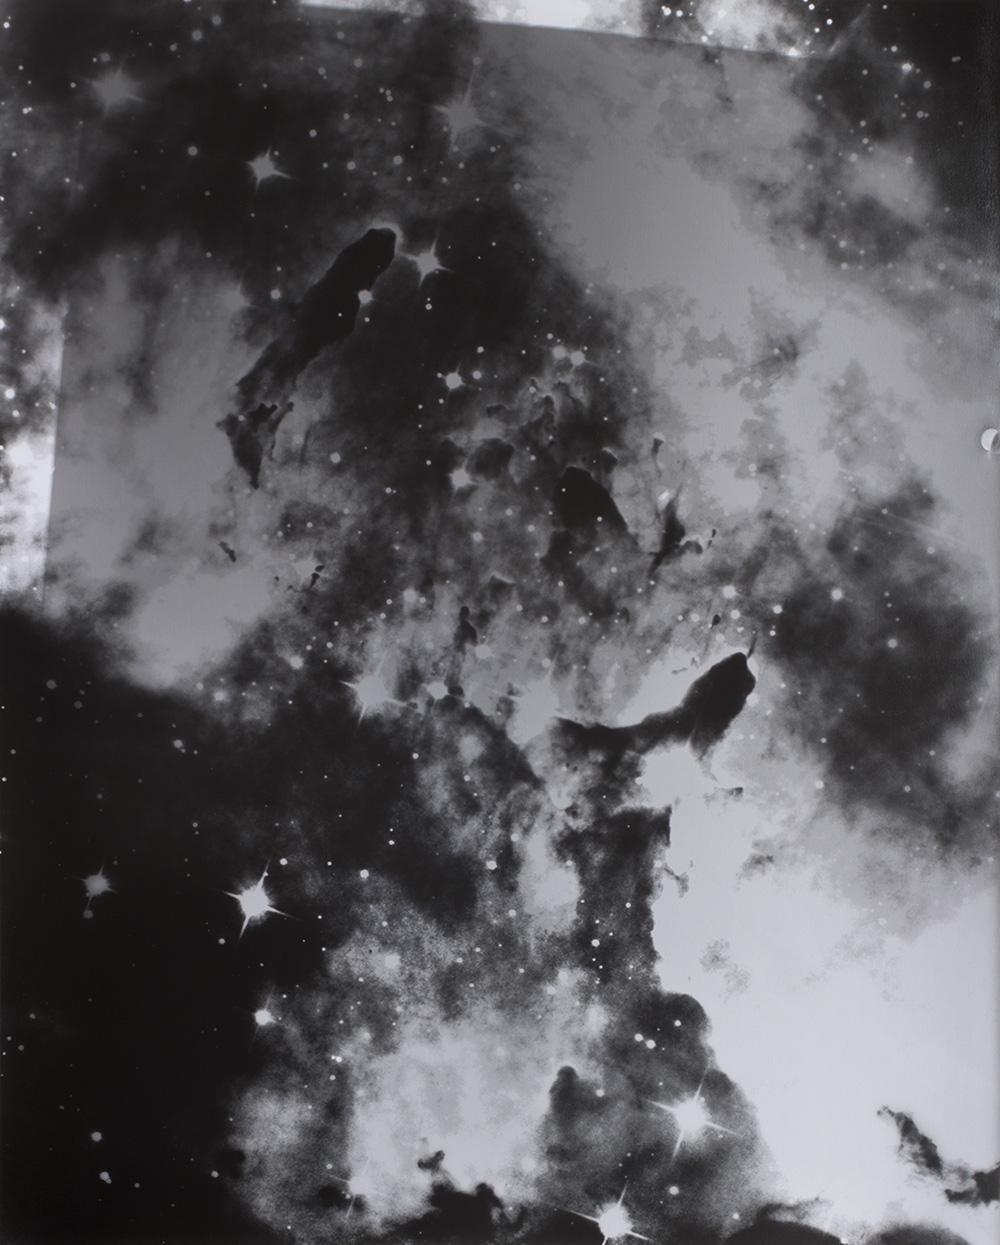 "Silver nebula , Gelatin silver print, 20x16"", 2016"